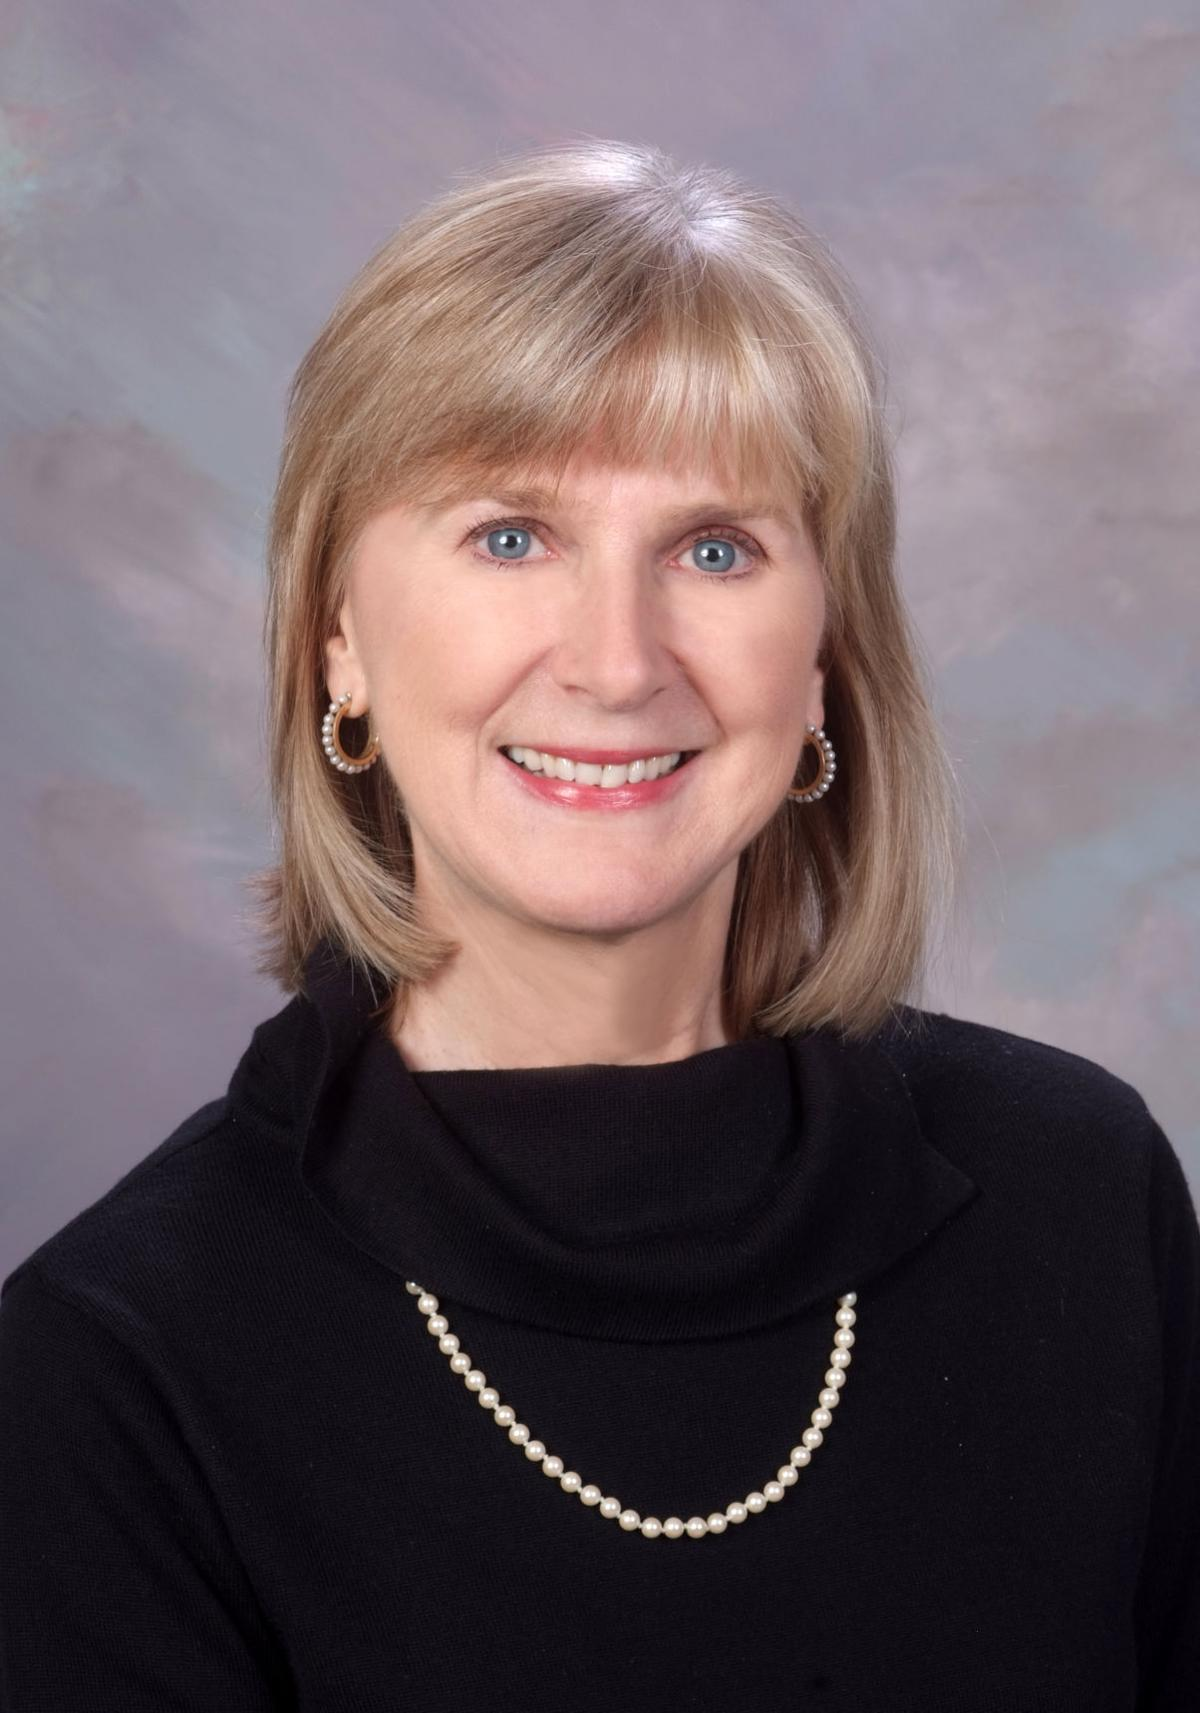 Nancy Whitworth